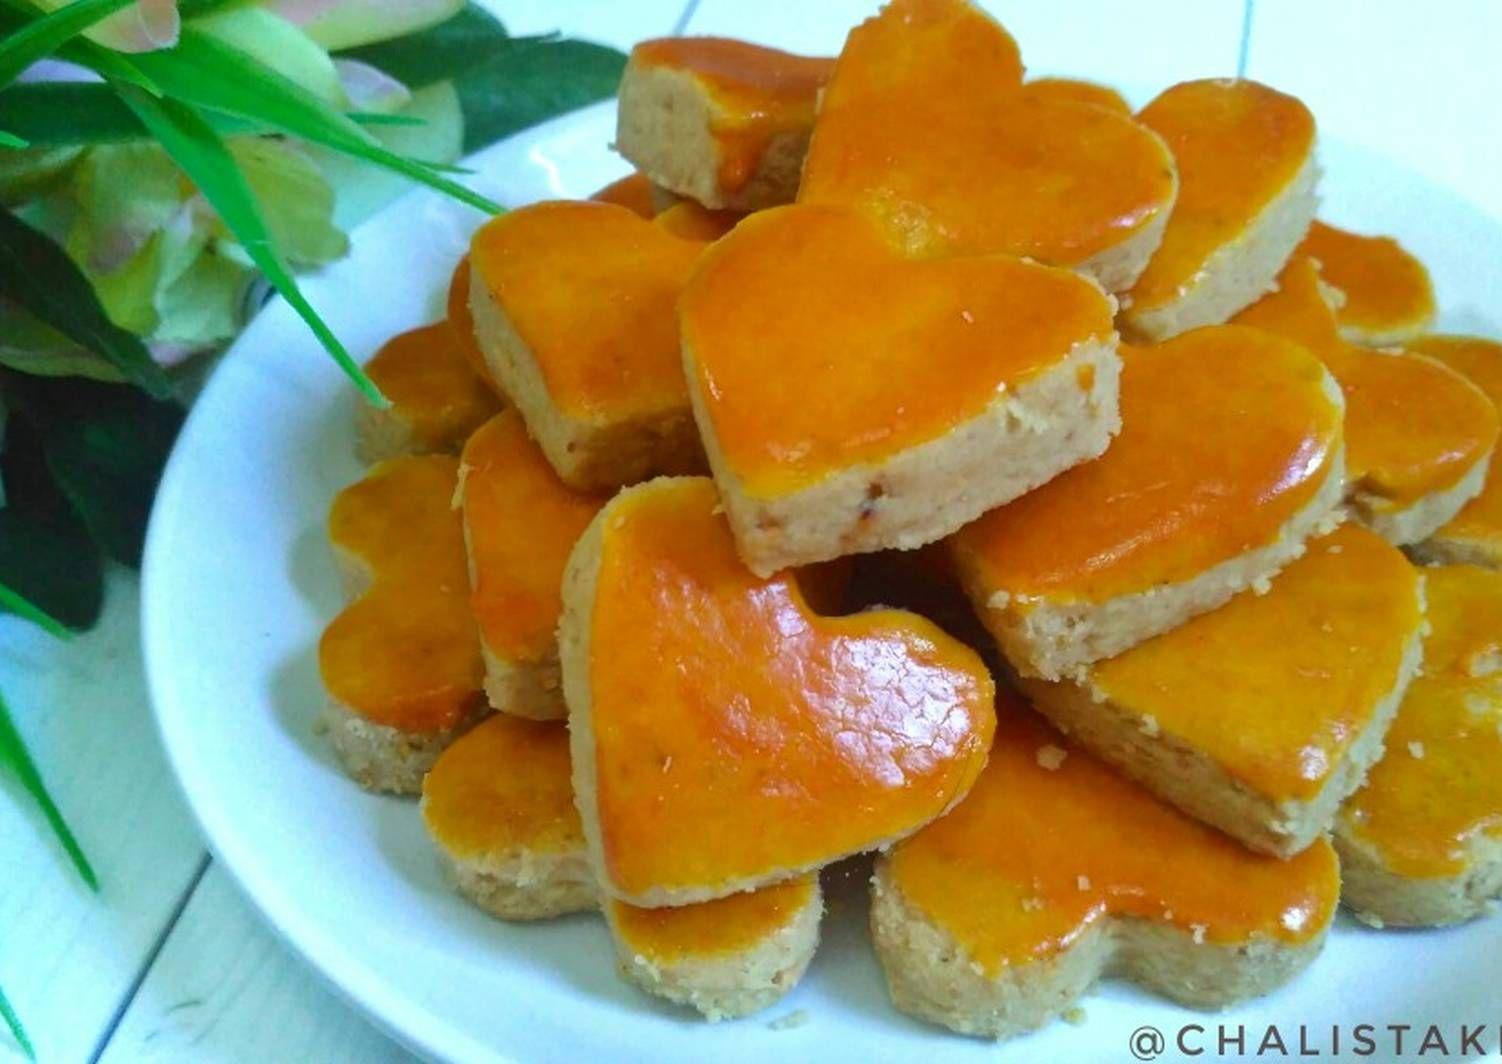 Resep Kue Kacang Jadul Renyah Dan Enak Oleh Chalistaa Kitchen Resep Resep Kue Kue Kering